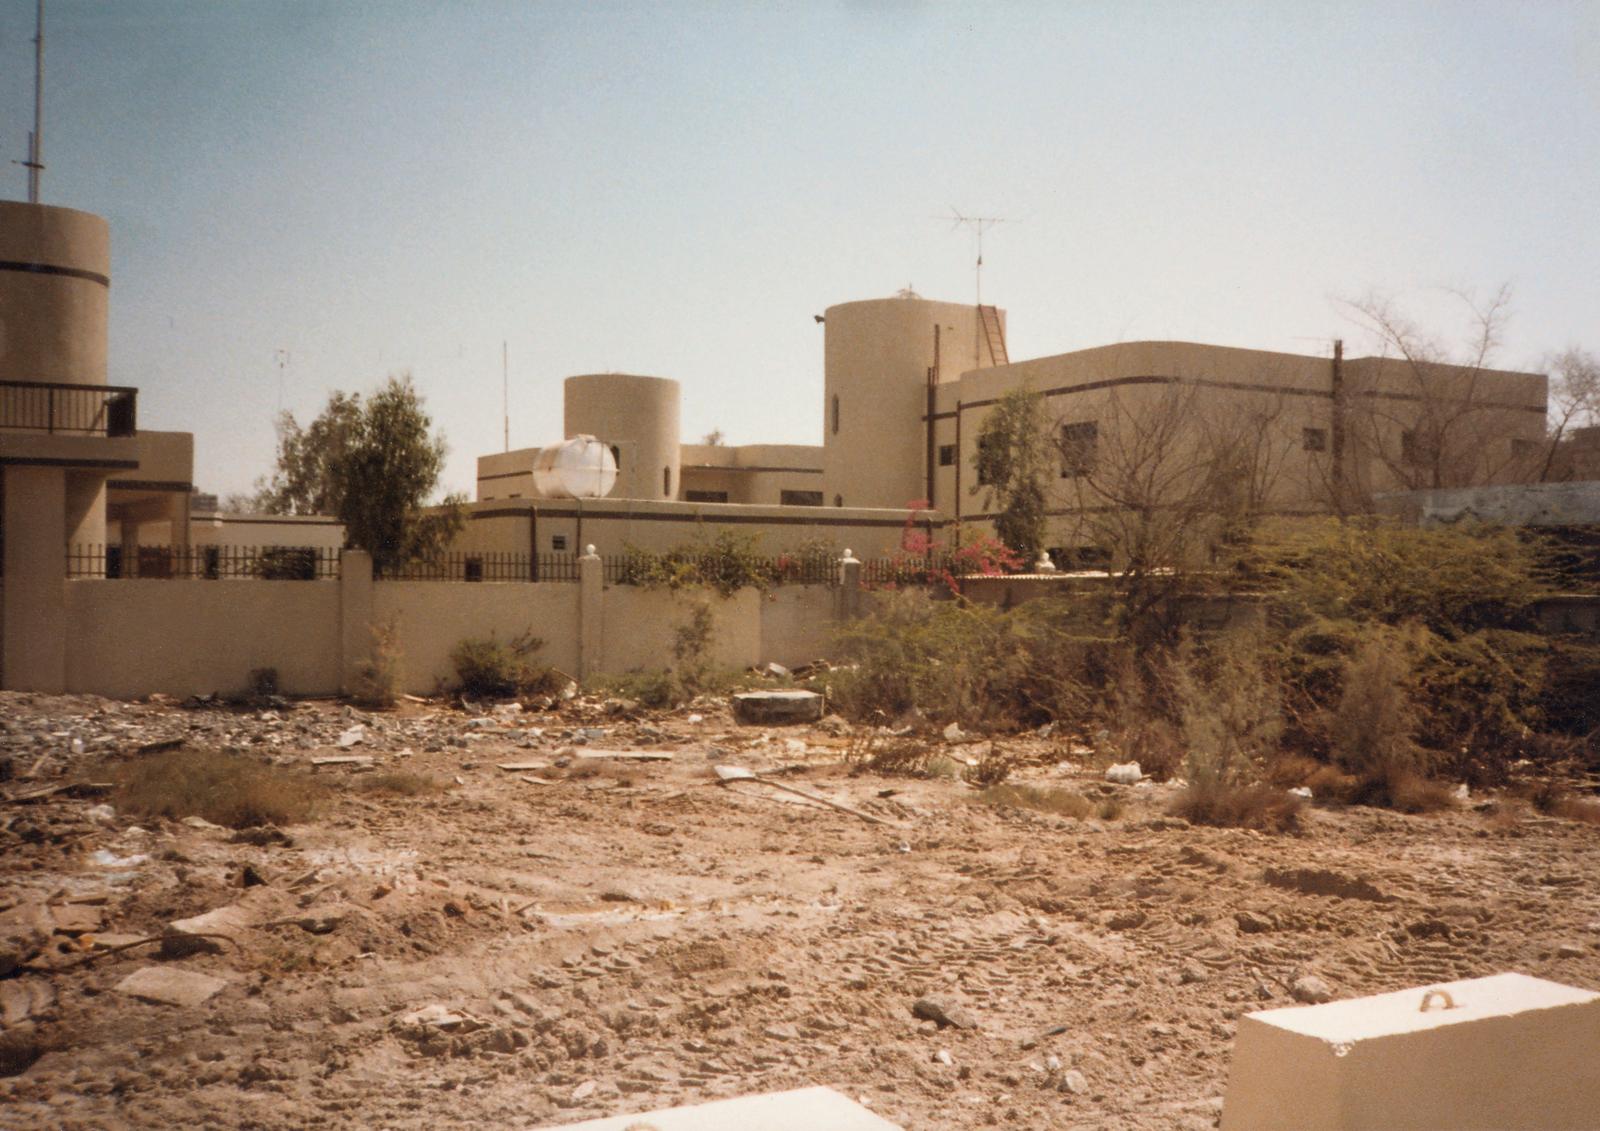 Abu Dhabi - Chancery Office Building - 1984